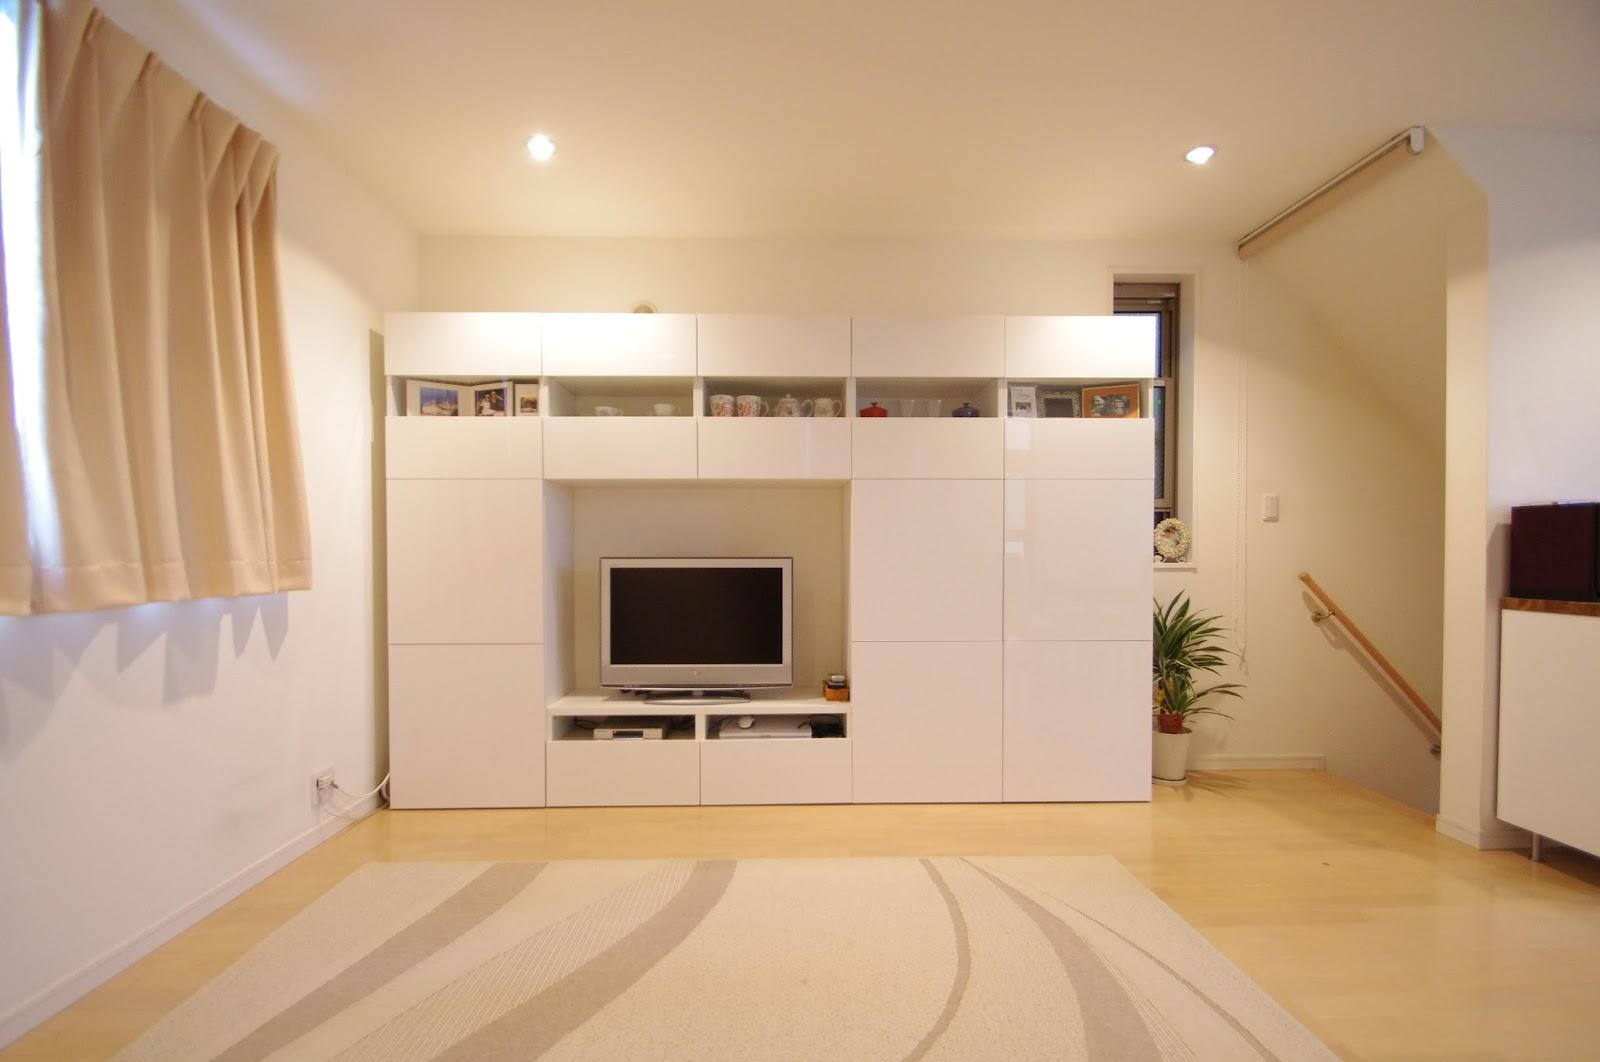 Besta Ikea Amazing Home Decors And Interior Design Ideas By  # Ikea Uppleva Pied